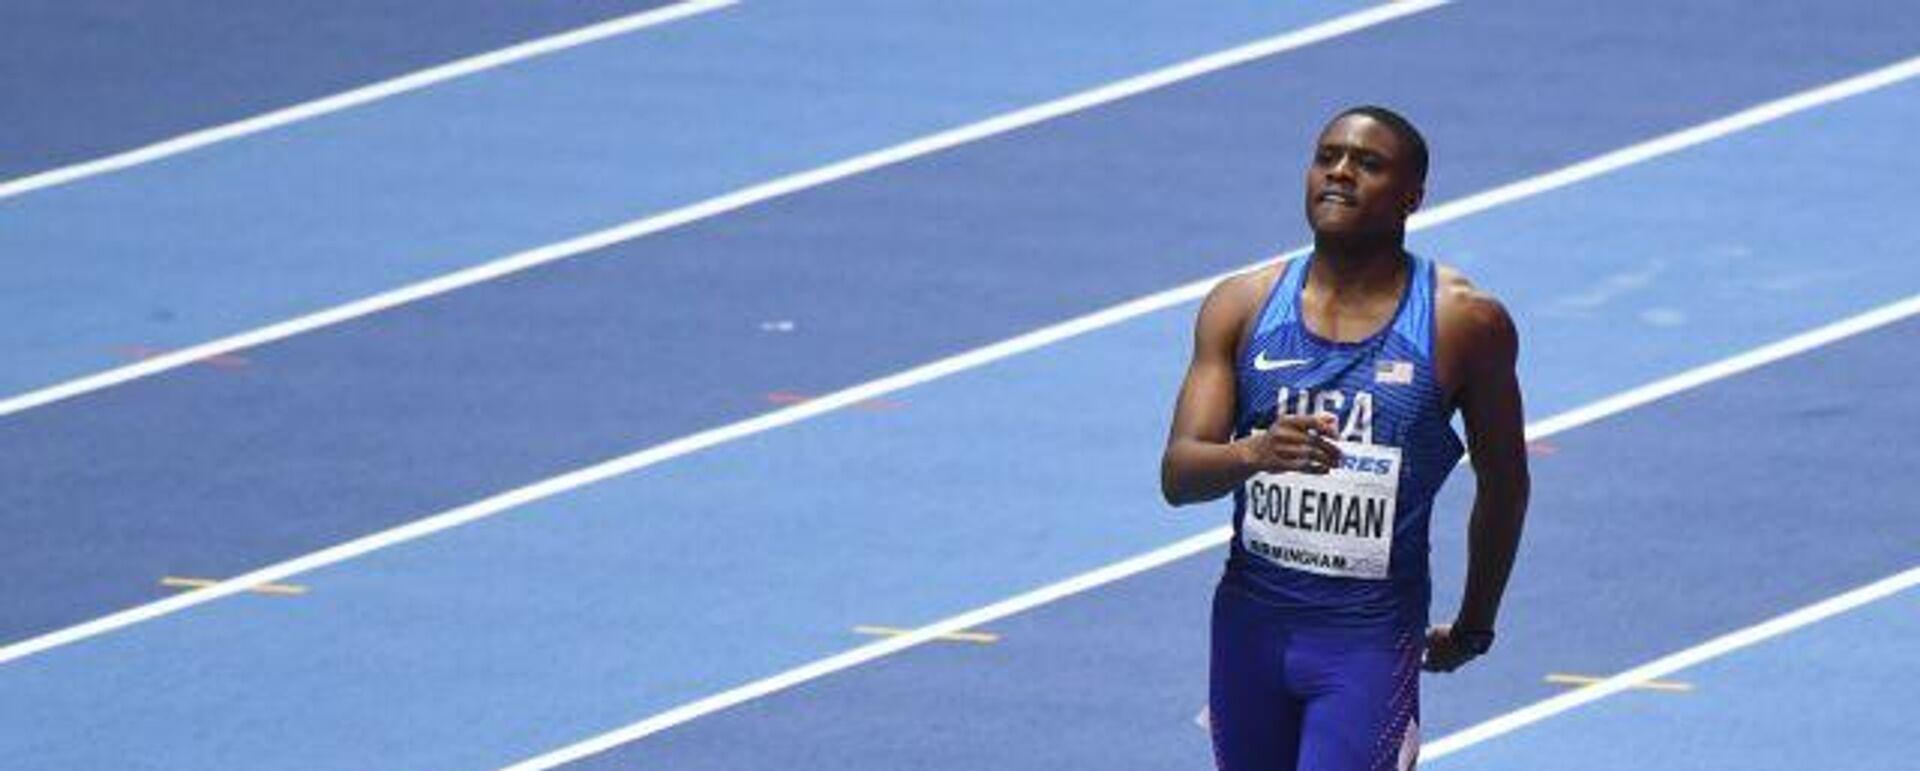 US-Sprintweltmeister Christian Coleman - SNA, 1920, 16.04.2021